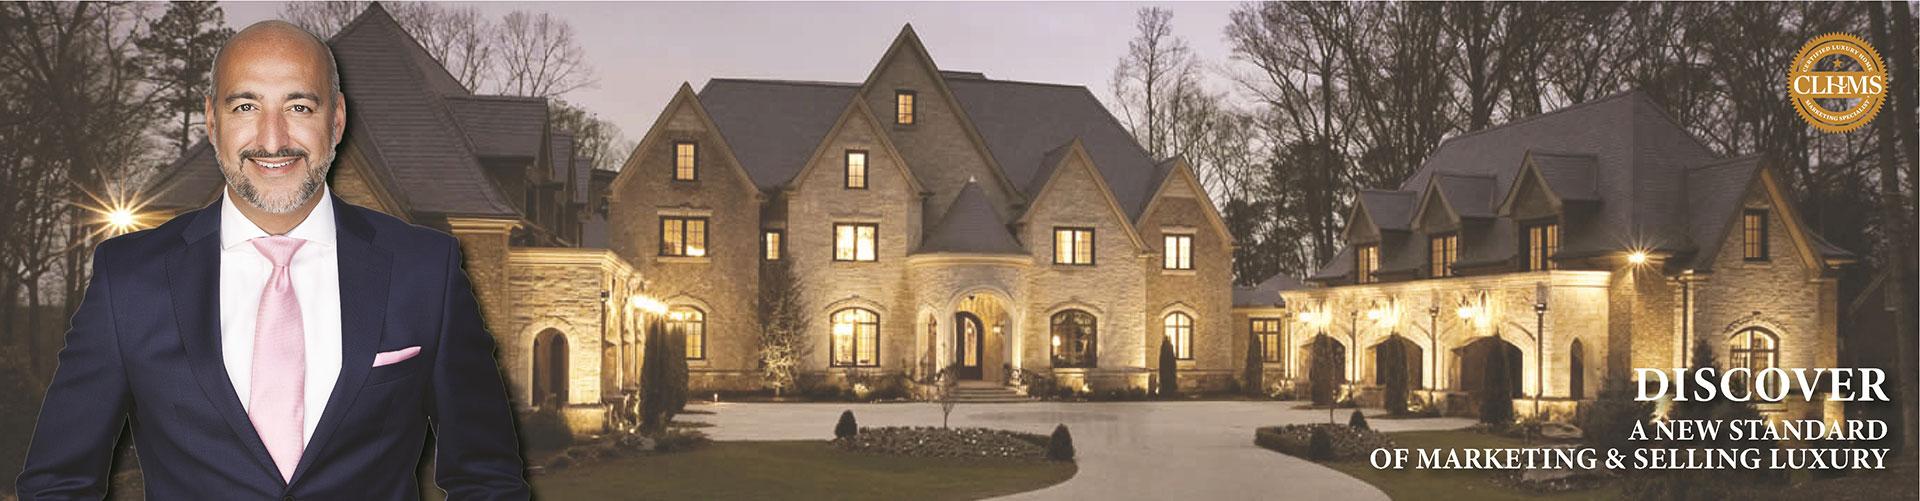 Top Luxury CLHMS - SRES - CNE - ABR - SRS Real Estate Broker Joseph Azimi In Toronto Vaughan Kleinburg Oakville Mississauga Brampton Milton Caledon Etobicoke Markham Richmond Hill Joseph Azimi, Broker 9